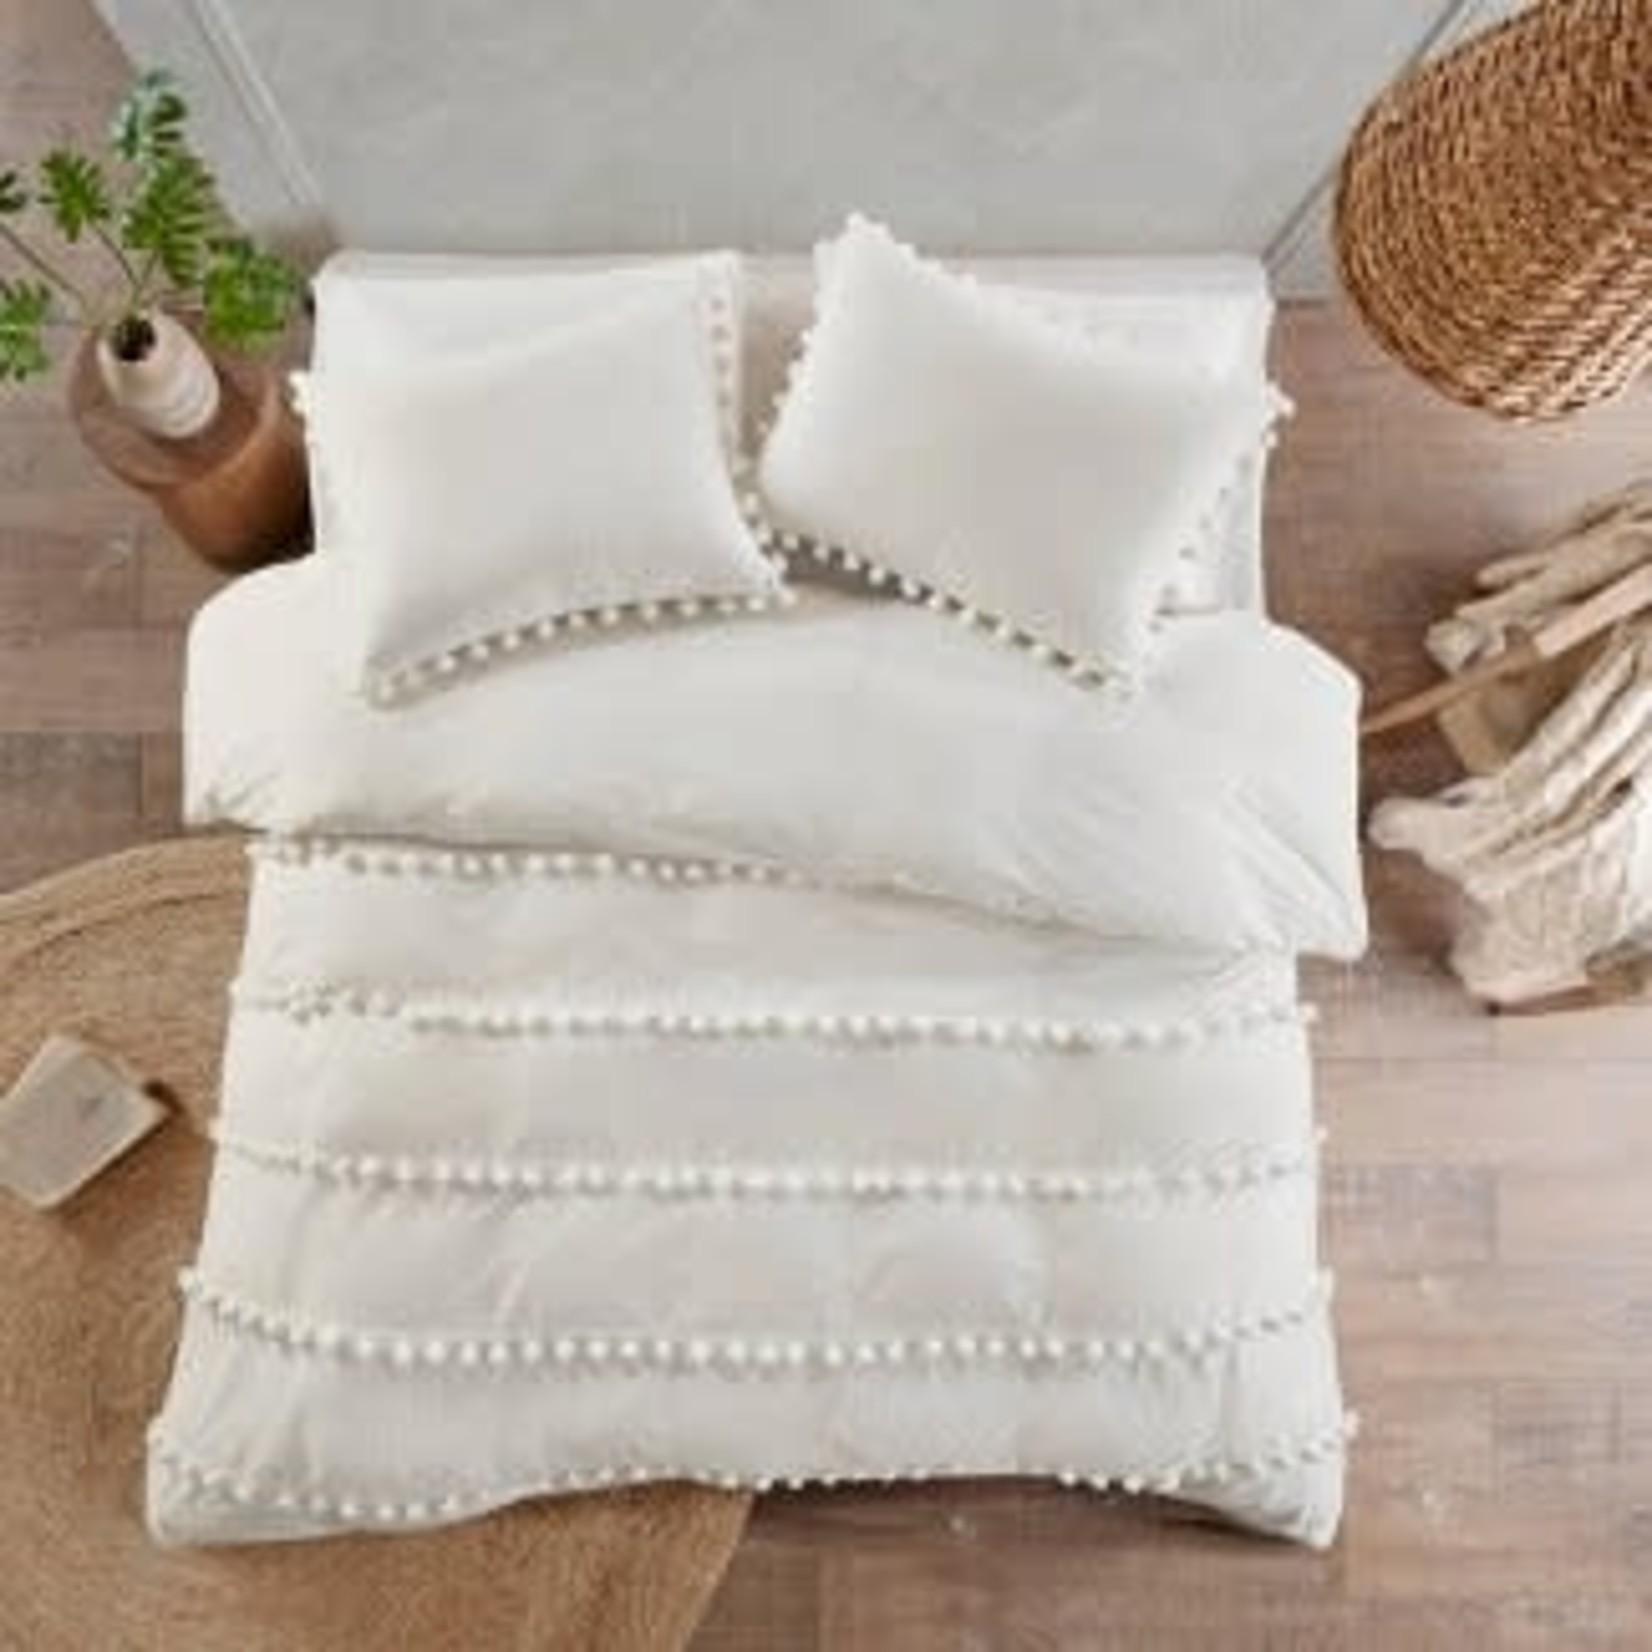 Elly Pom Pom Cotton Duvet KING Cover Set *Open box, small stain on pillowcase